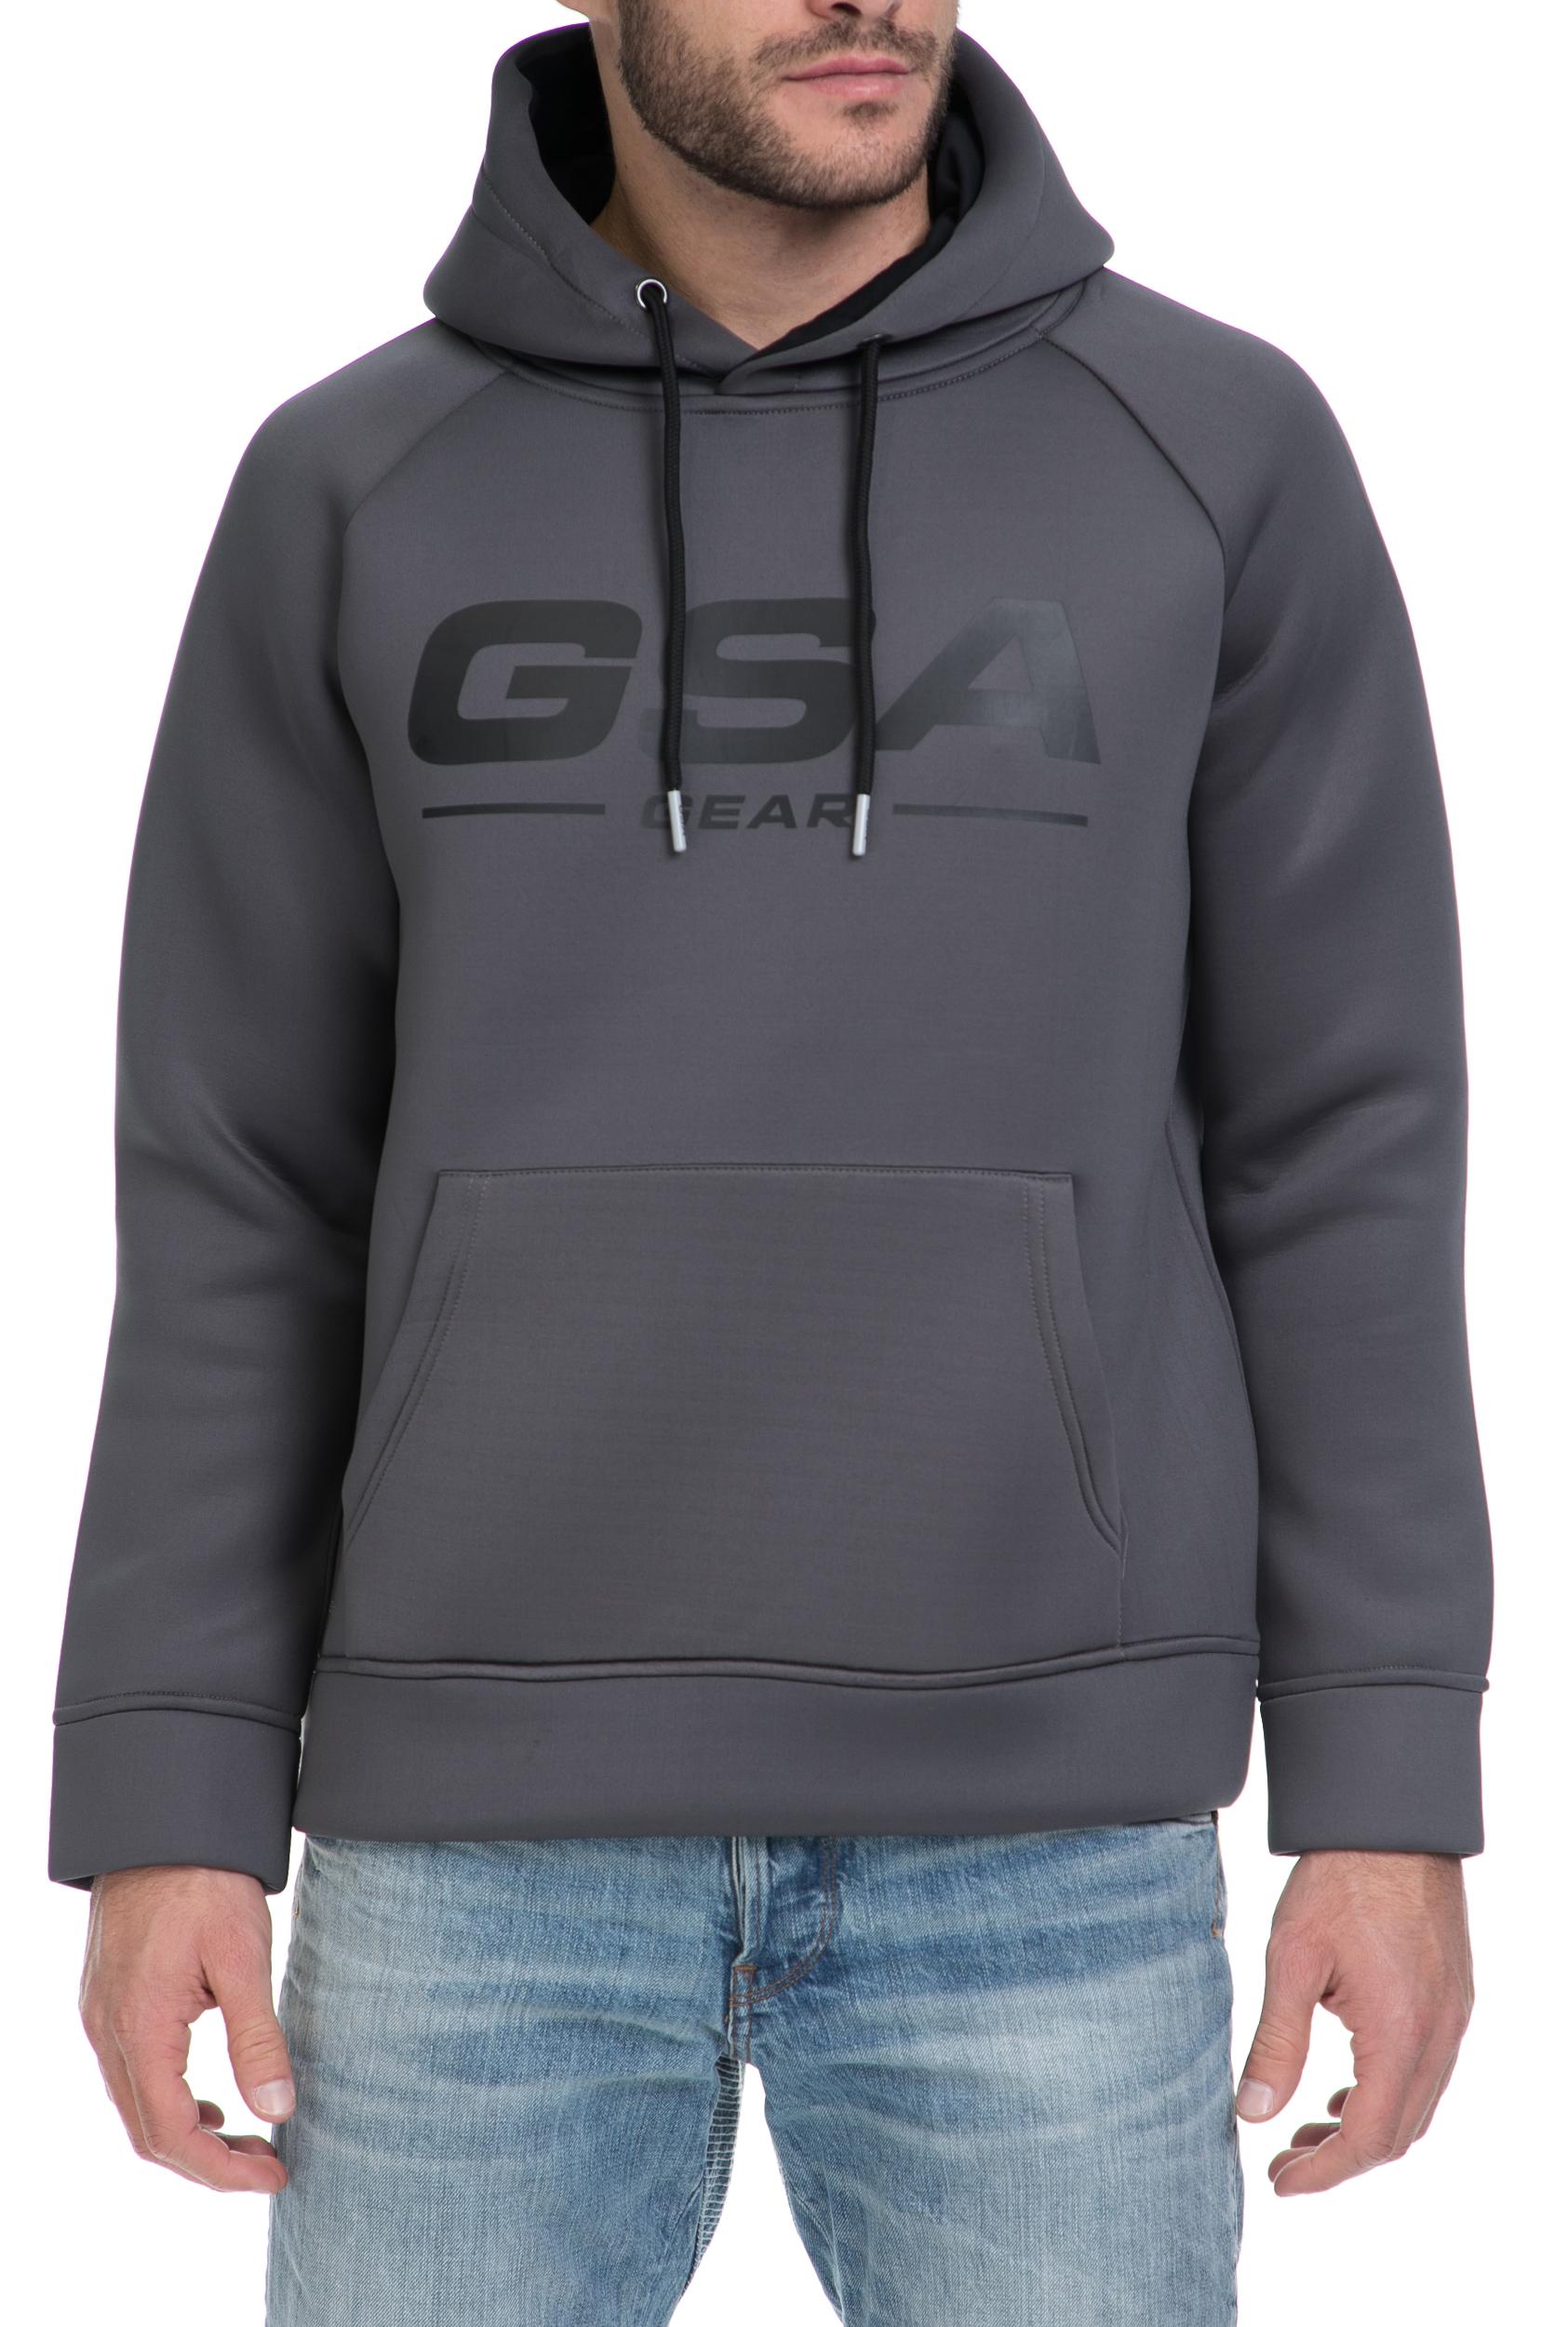 CollectiveOnline GSA - Ανδρική μπλούζα GSA SCUBATECH γκρι 7d7cf6fff5f